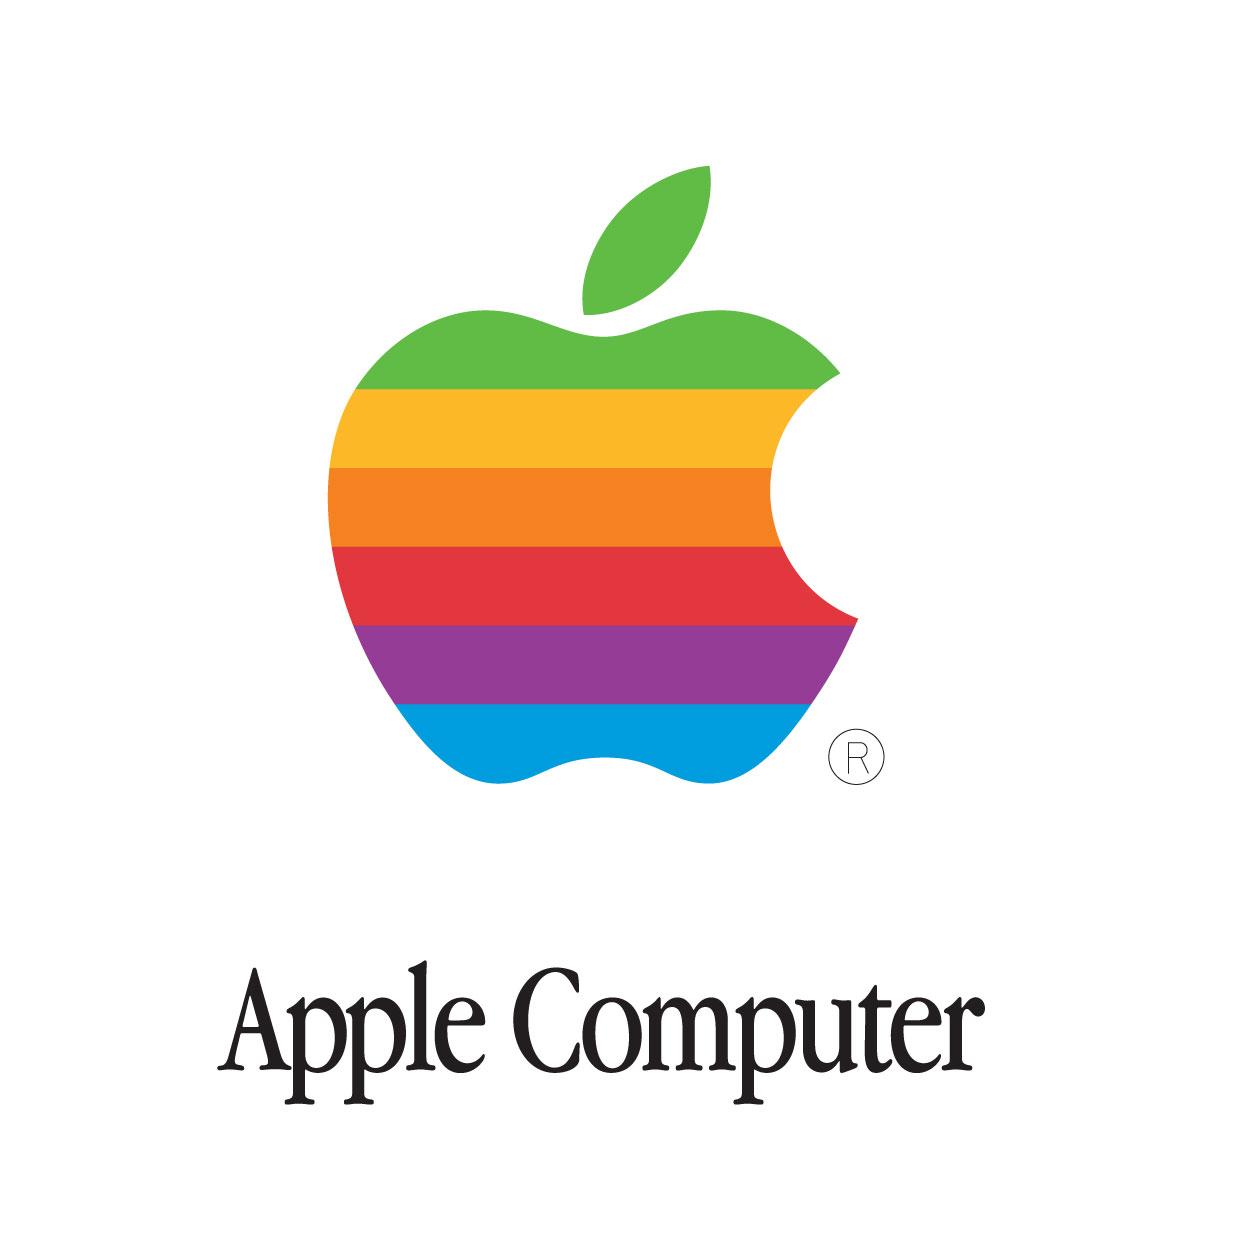 Apple Inc. clipart company logo Knobs Waverley Apple rainbow logo